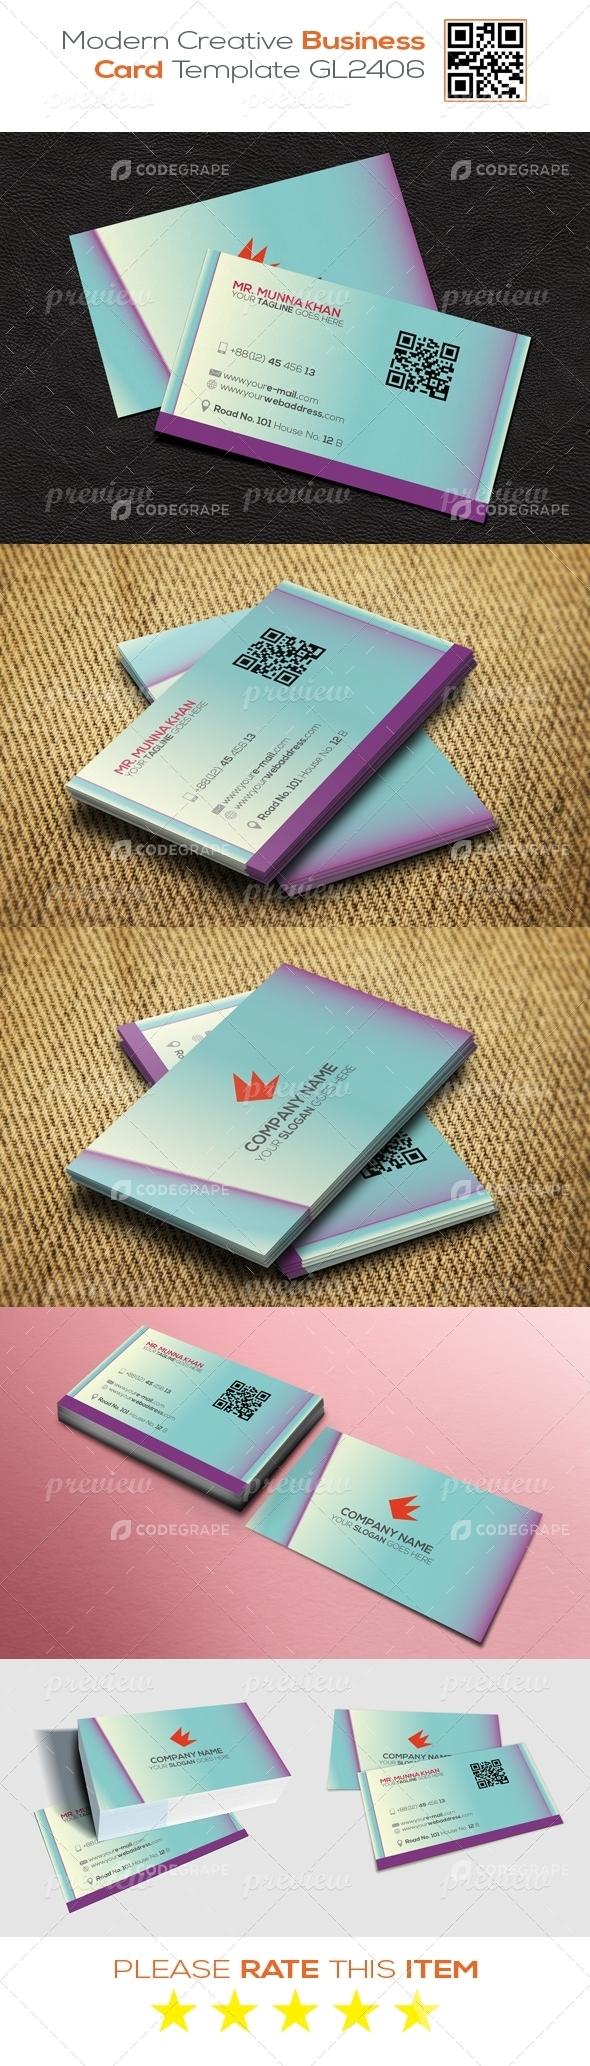 Modern Creative Business Card Template GL2406